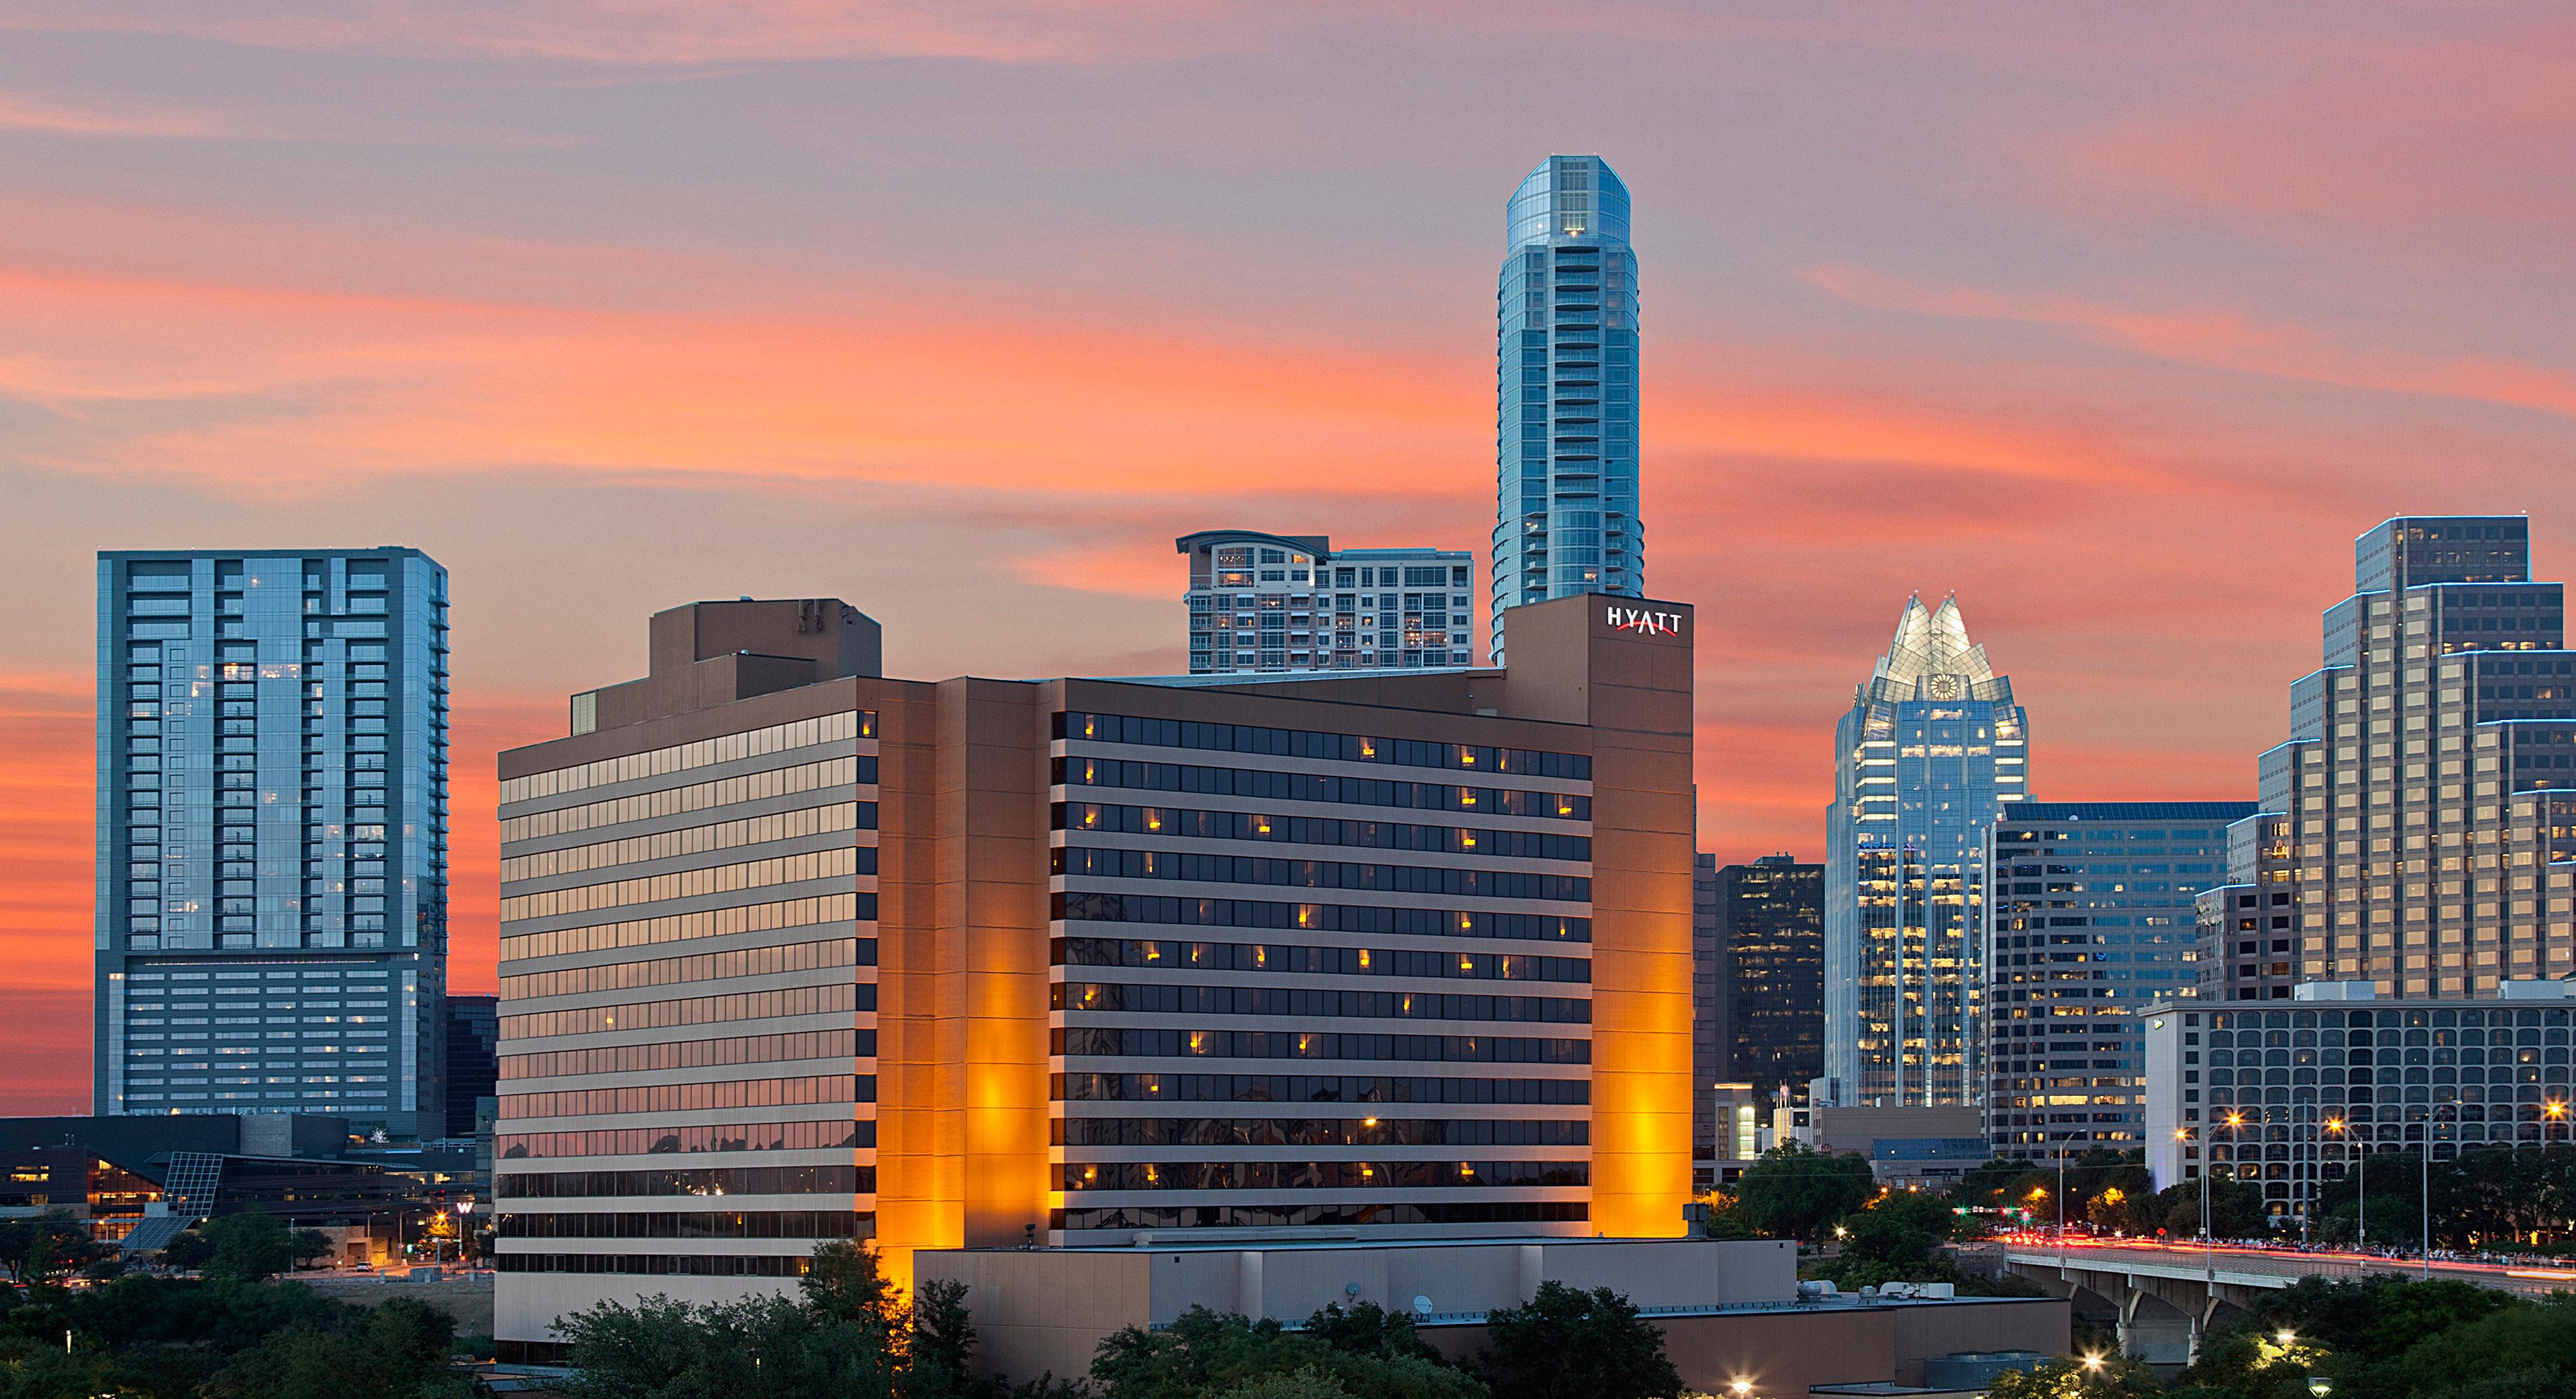 Texas 18 - Austin Texas Hyatt